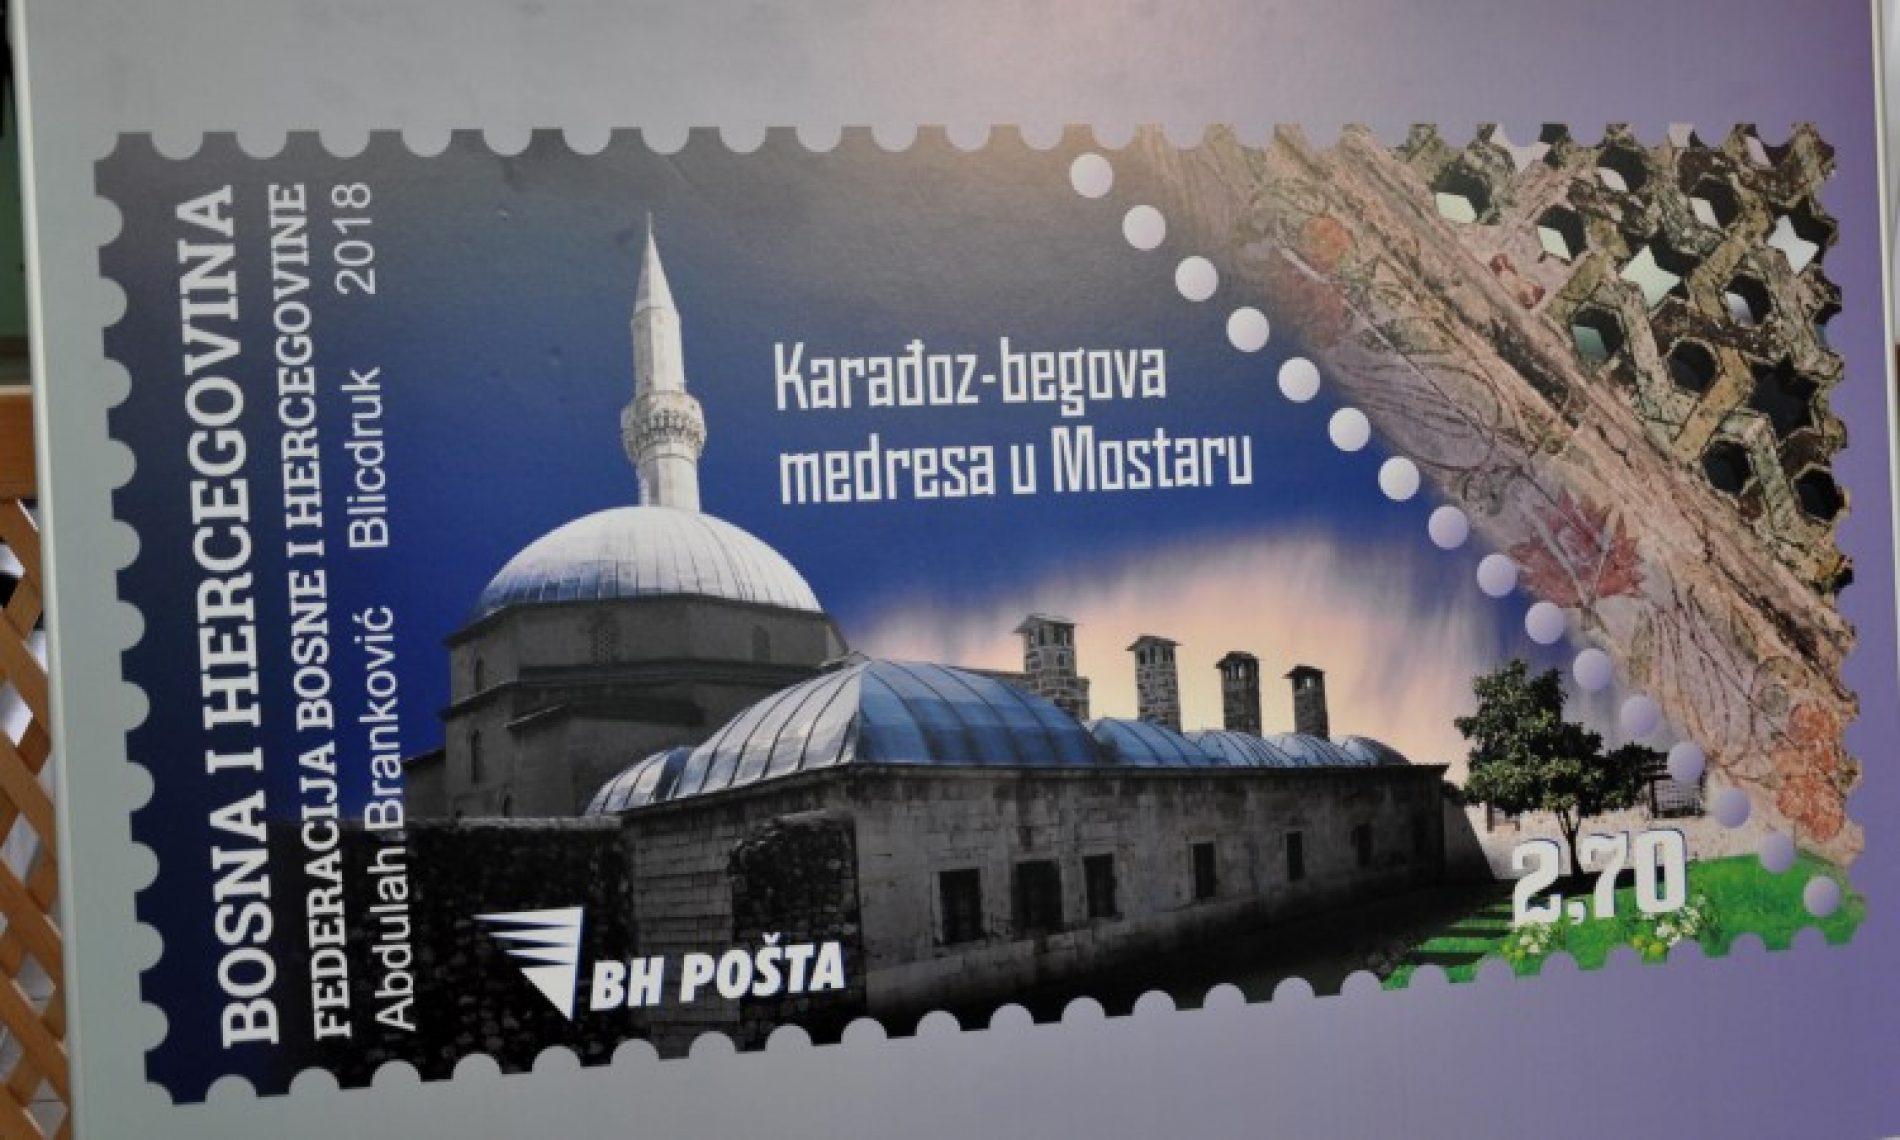 U Mostaru promovisana poštanska marka 'Karađoz-begova medresa'